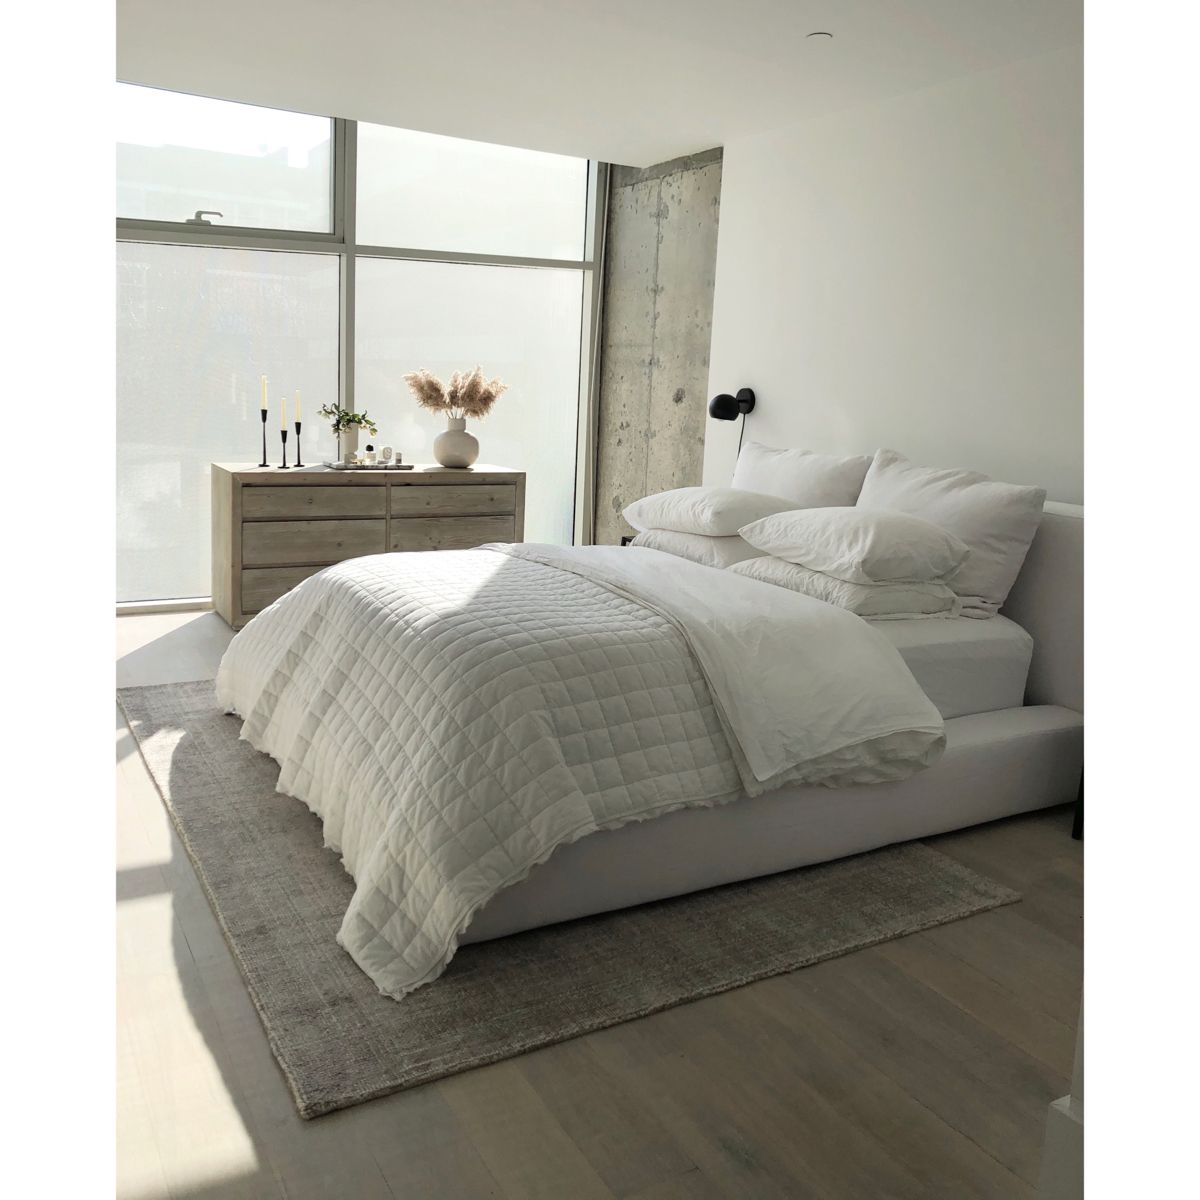 #minimalstyle  #minimalism #neutral #bedroom #whitebedroom #whitebedroomideas #designinspo #neutraldecor #neutalbedeoom #modern #modernbedroom #bleachedfloors